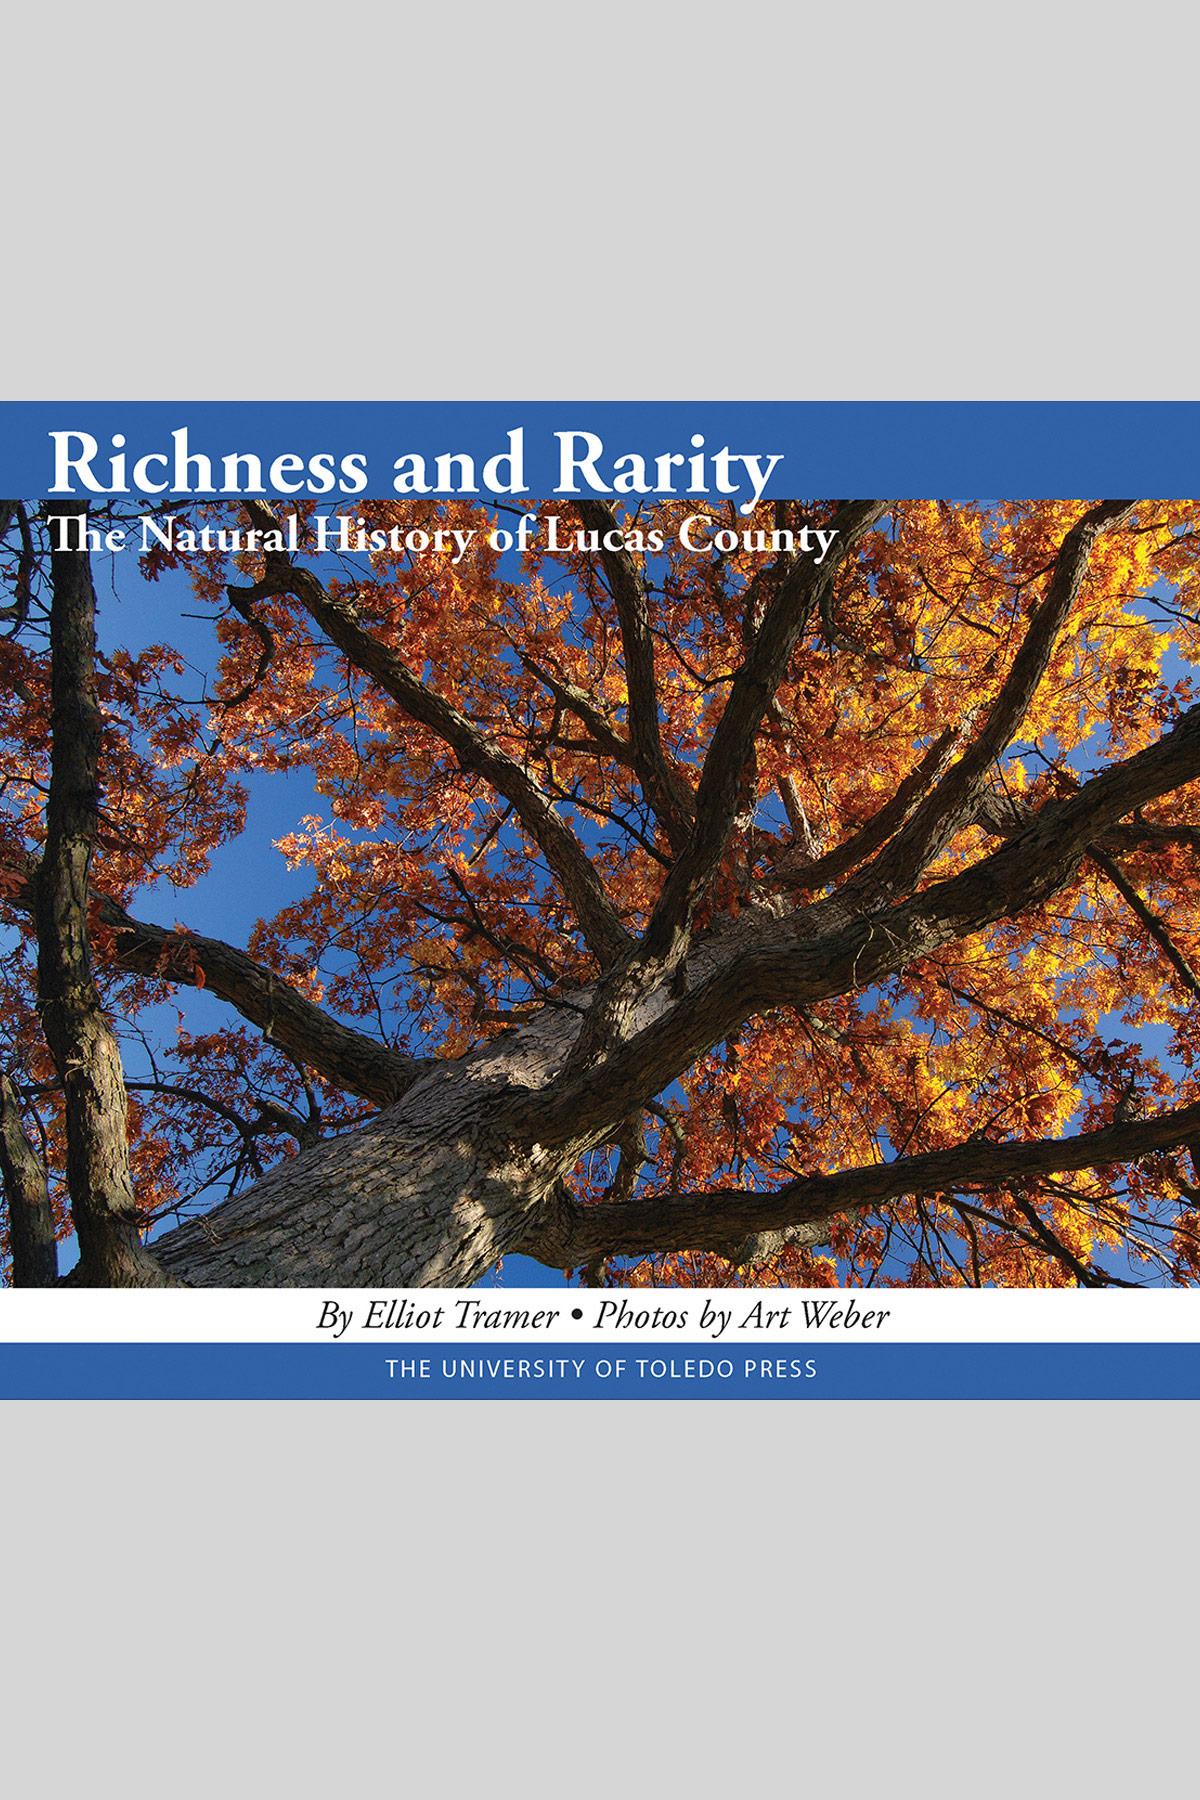 Richness & Rarity